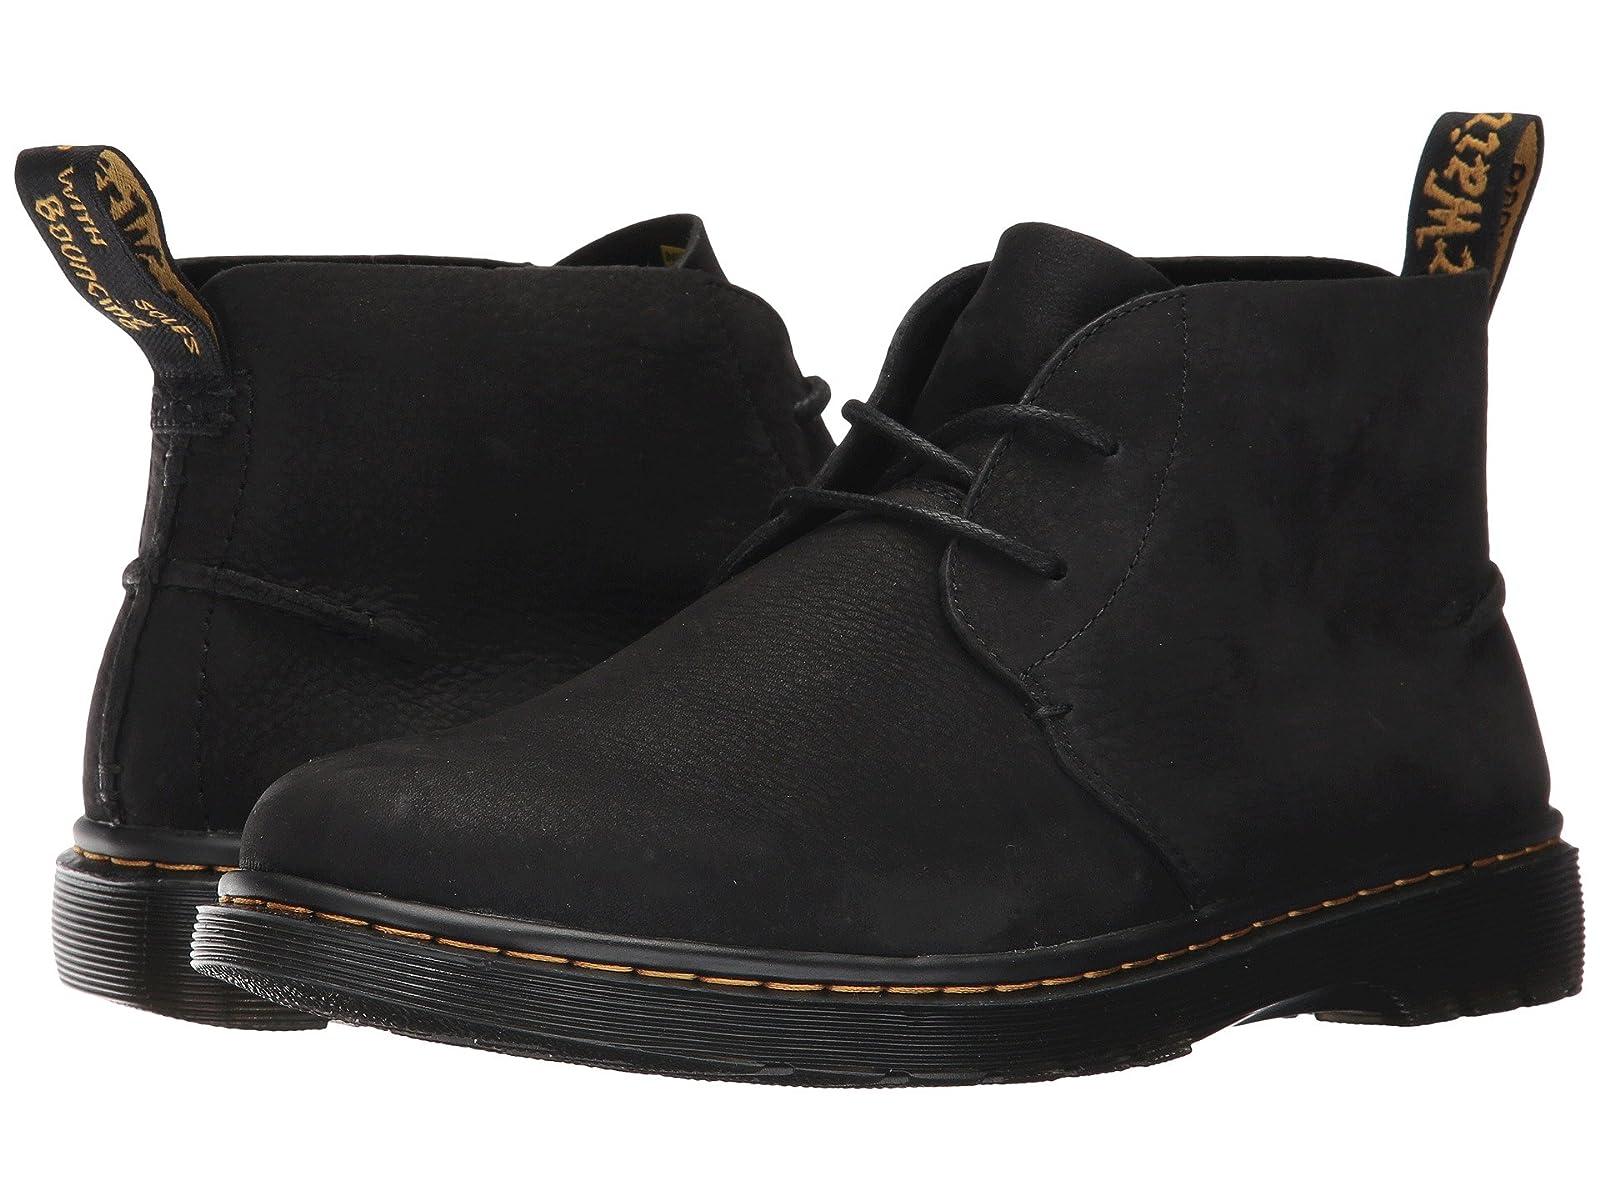 Dr. Martens Ember Desert BootCheap and distinctive eye-catching shoes